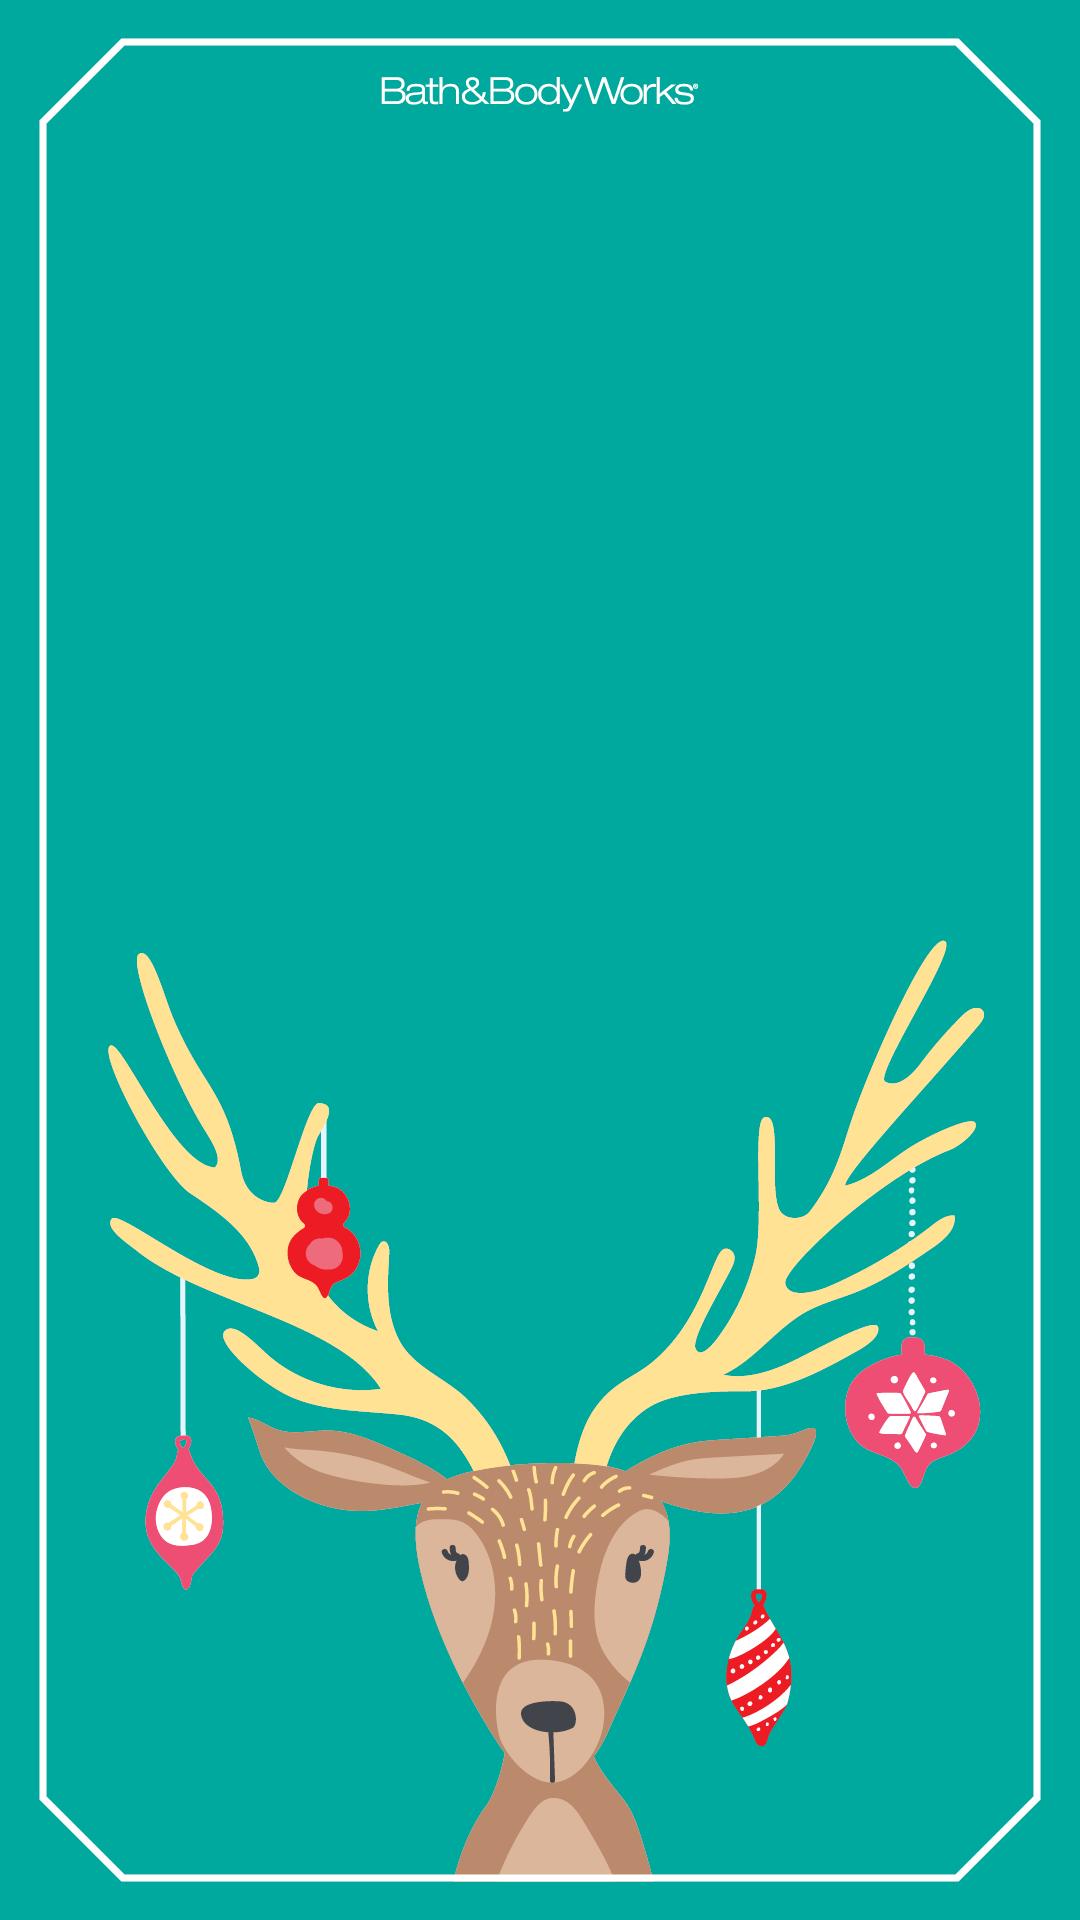 Christmas Reindeer Wallpaper Iphone Wallpaper Cat Wallpaper Iphone Christmas Holiday Iphone Wallpaper